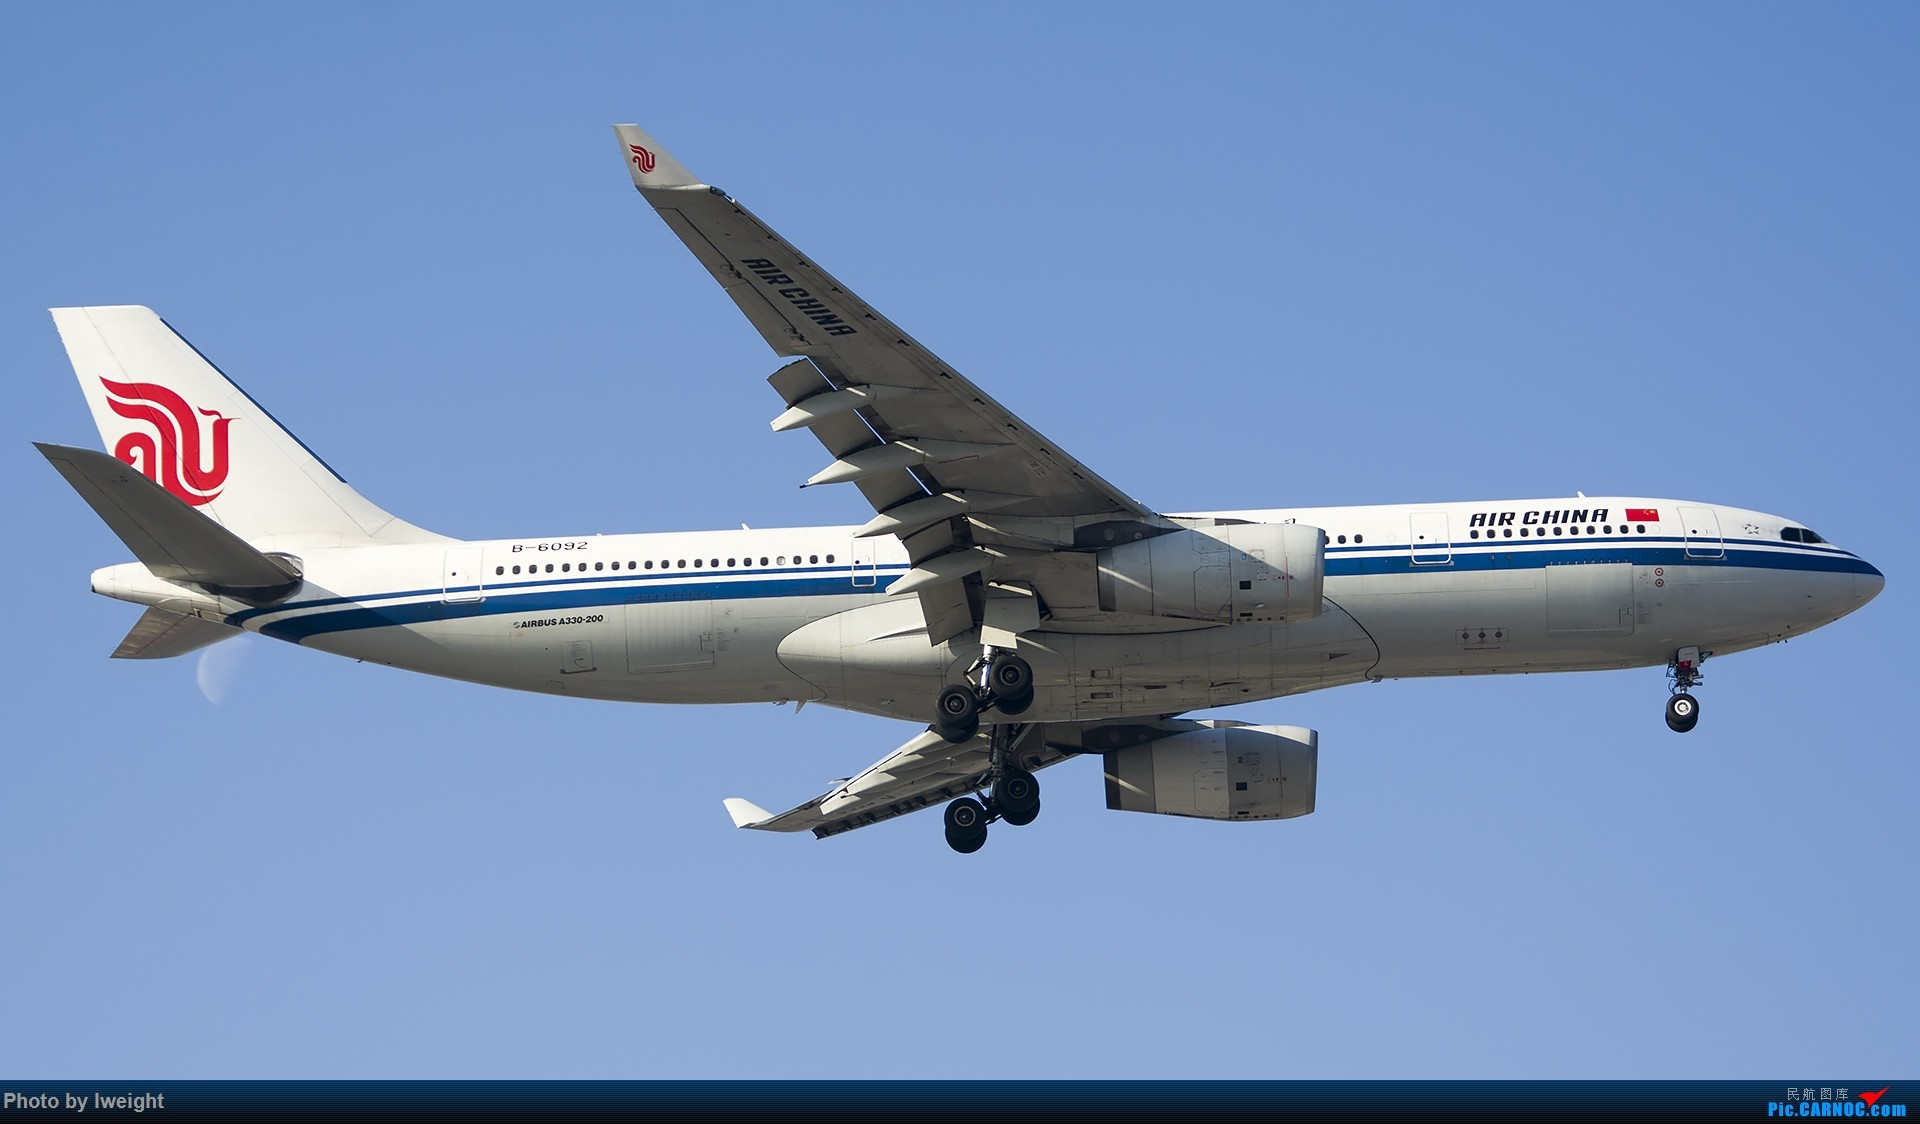 Re:[原创]庆祝升级777,发上今天在首都机场拍的所有飞机【2014-12-14】 AIRBUS A330-200 B-6092 中国北京首都国际机场